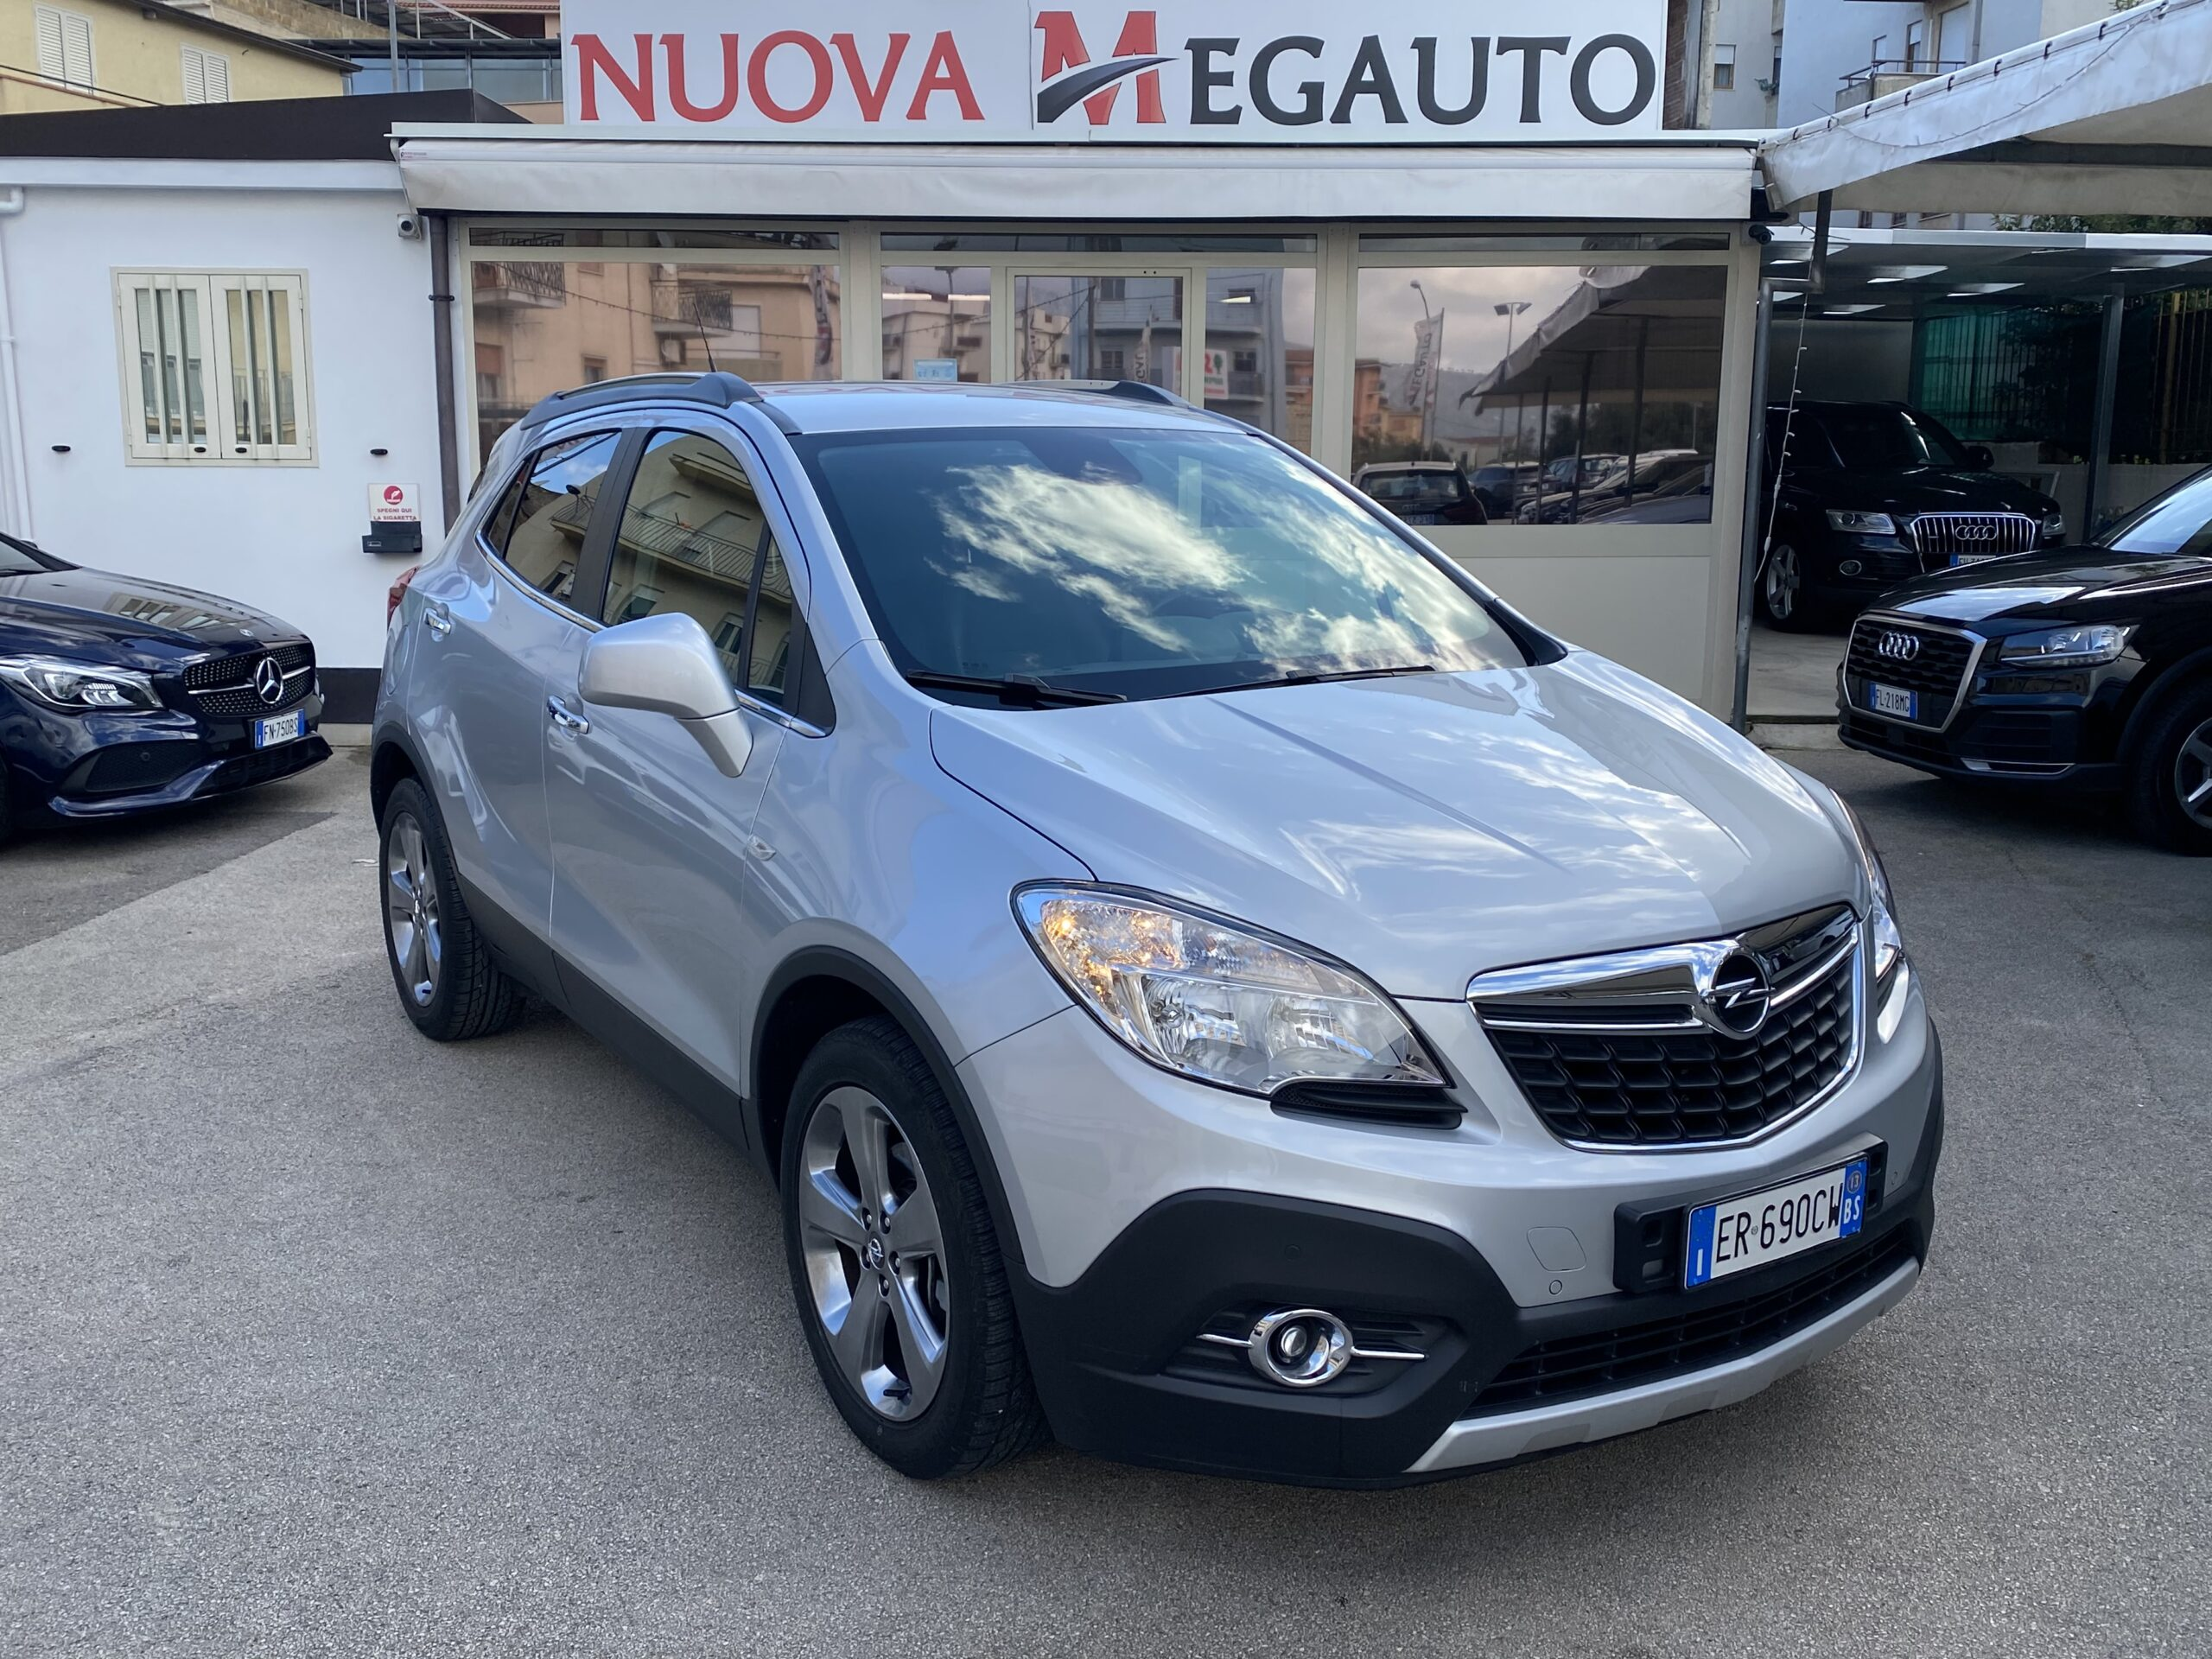 Opel Mokka 1.7 CDTI Ecotec 130CV 4×2 Aut. Cosmo